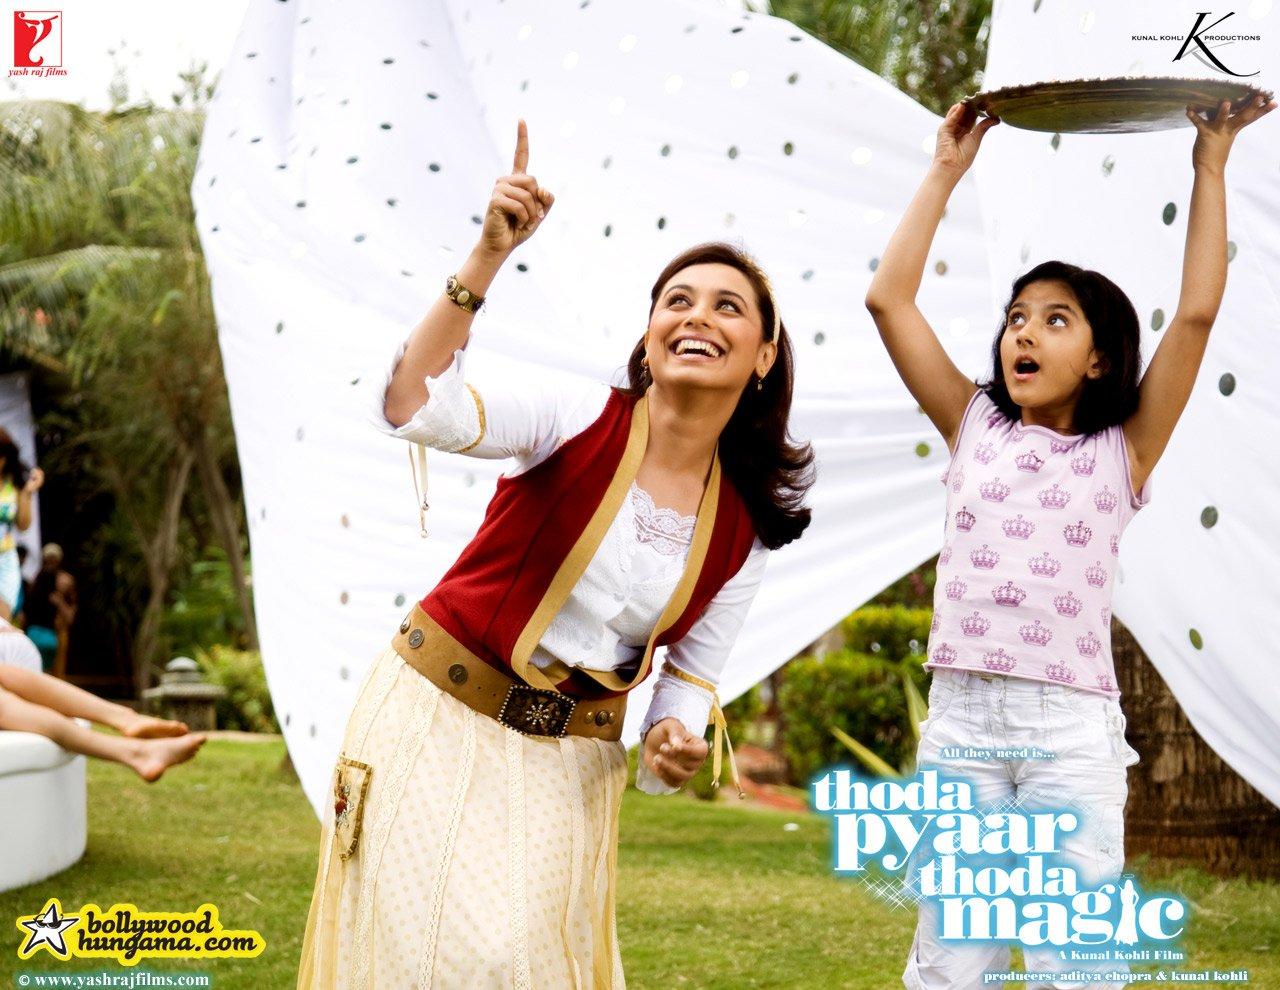 http://i.indiafm.com/posters/movies/08/thodapyaarthodamagic/still20.jpg